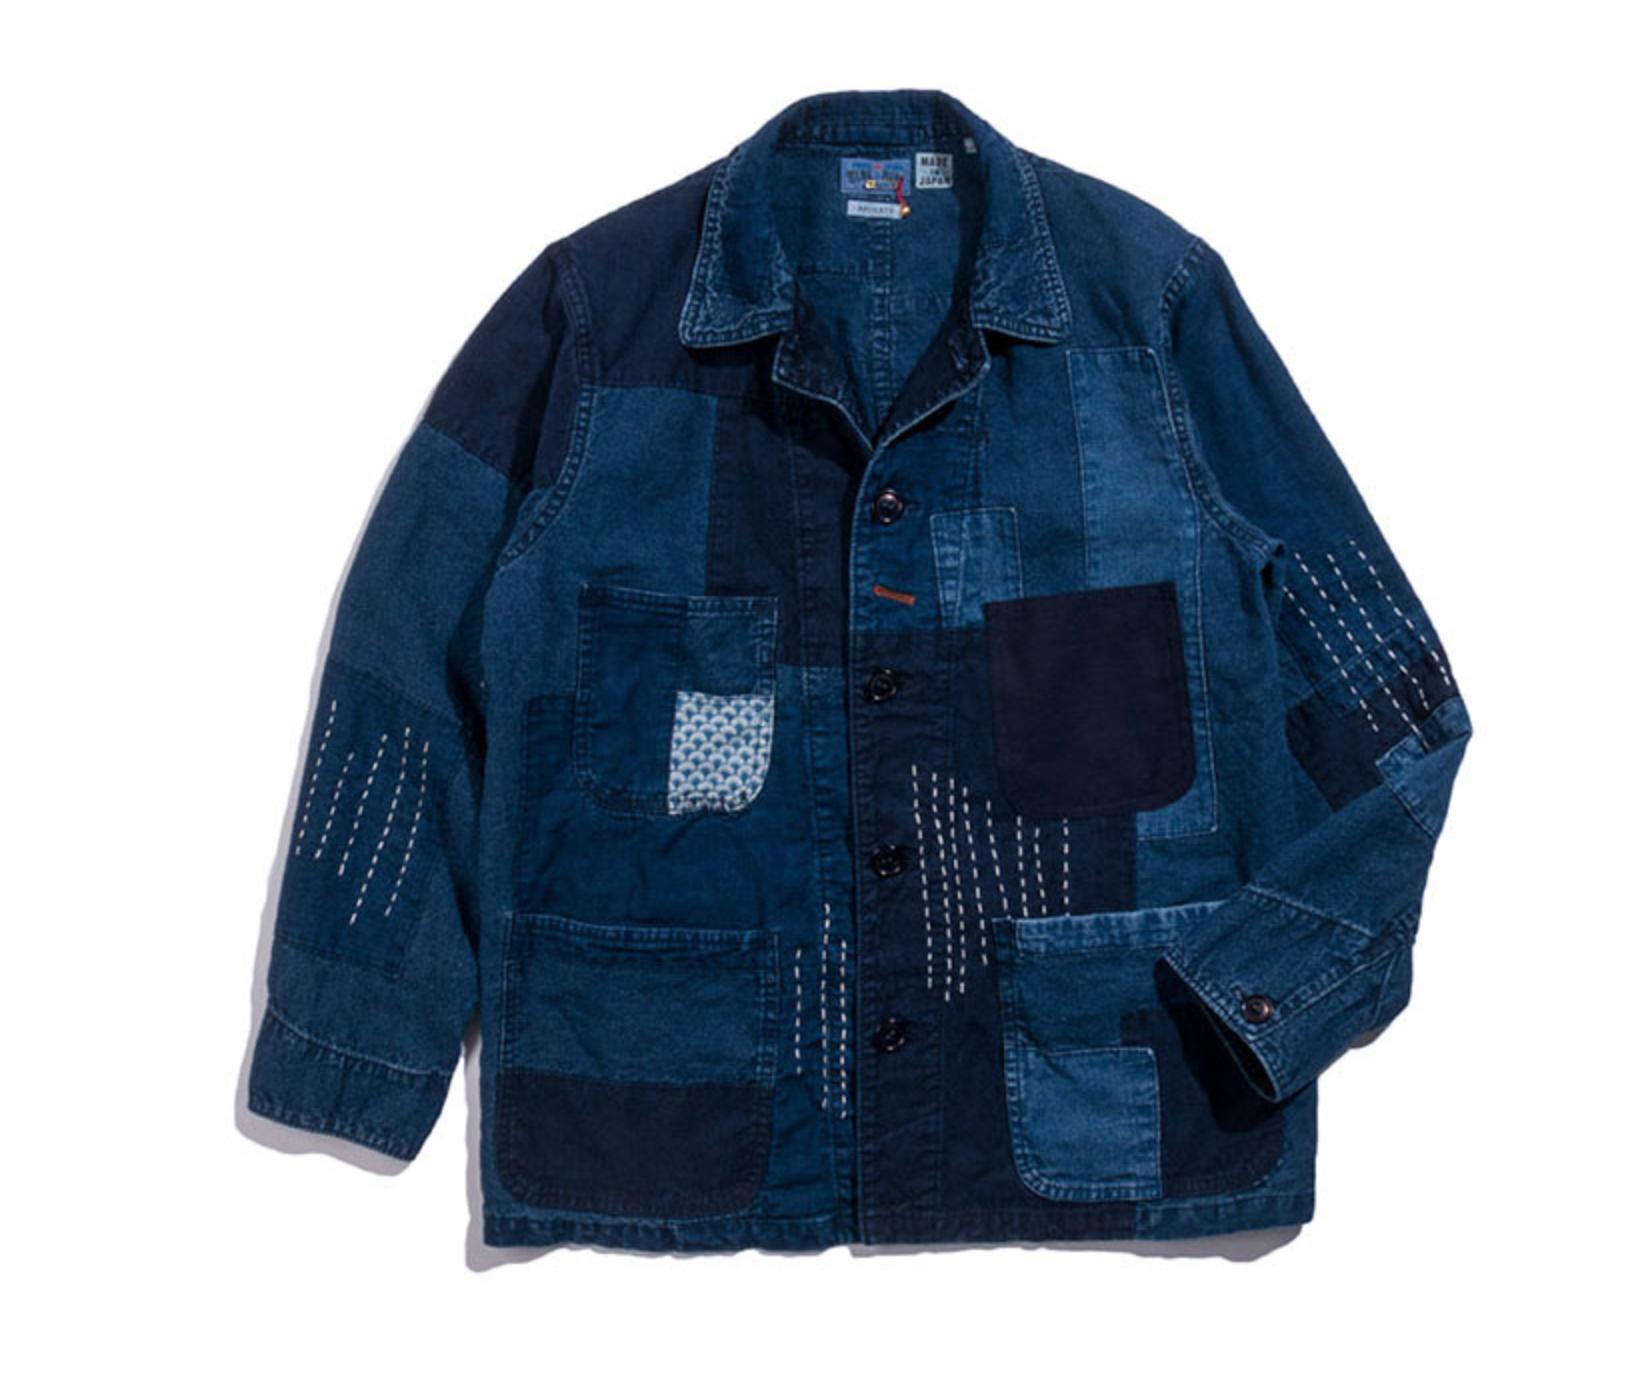 indigo Patchwork Jacket